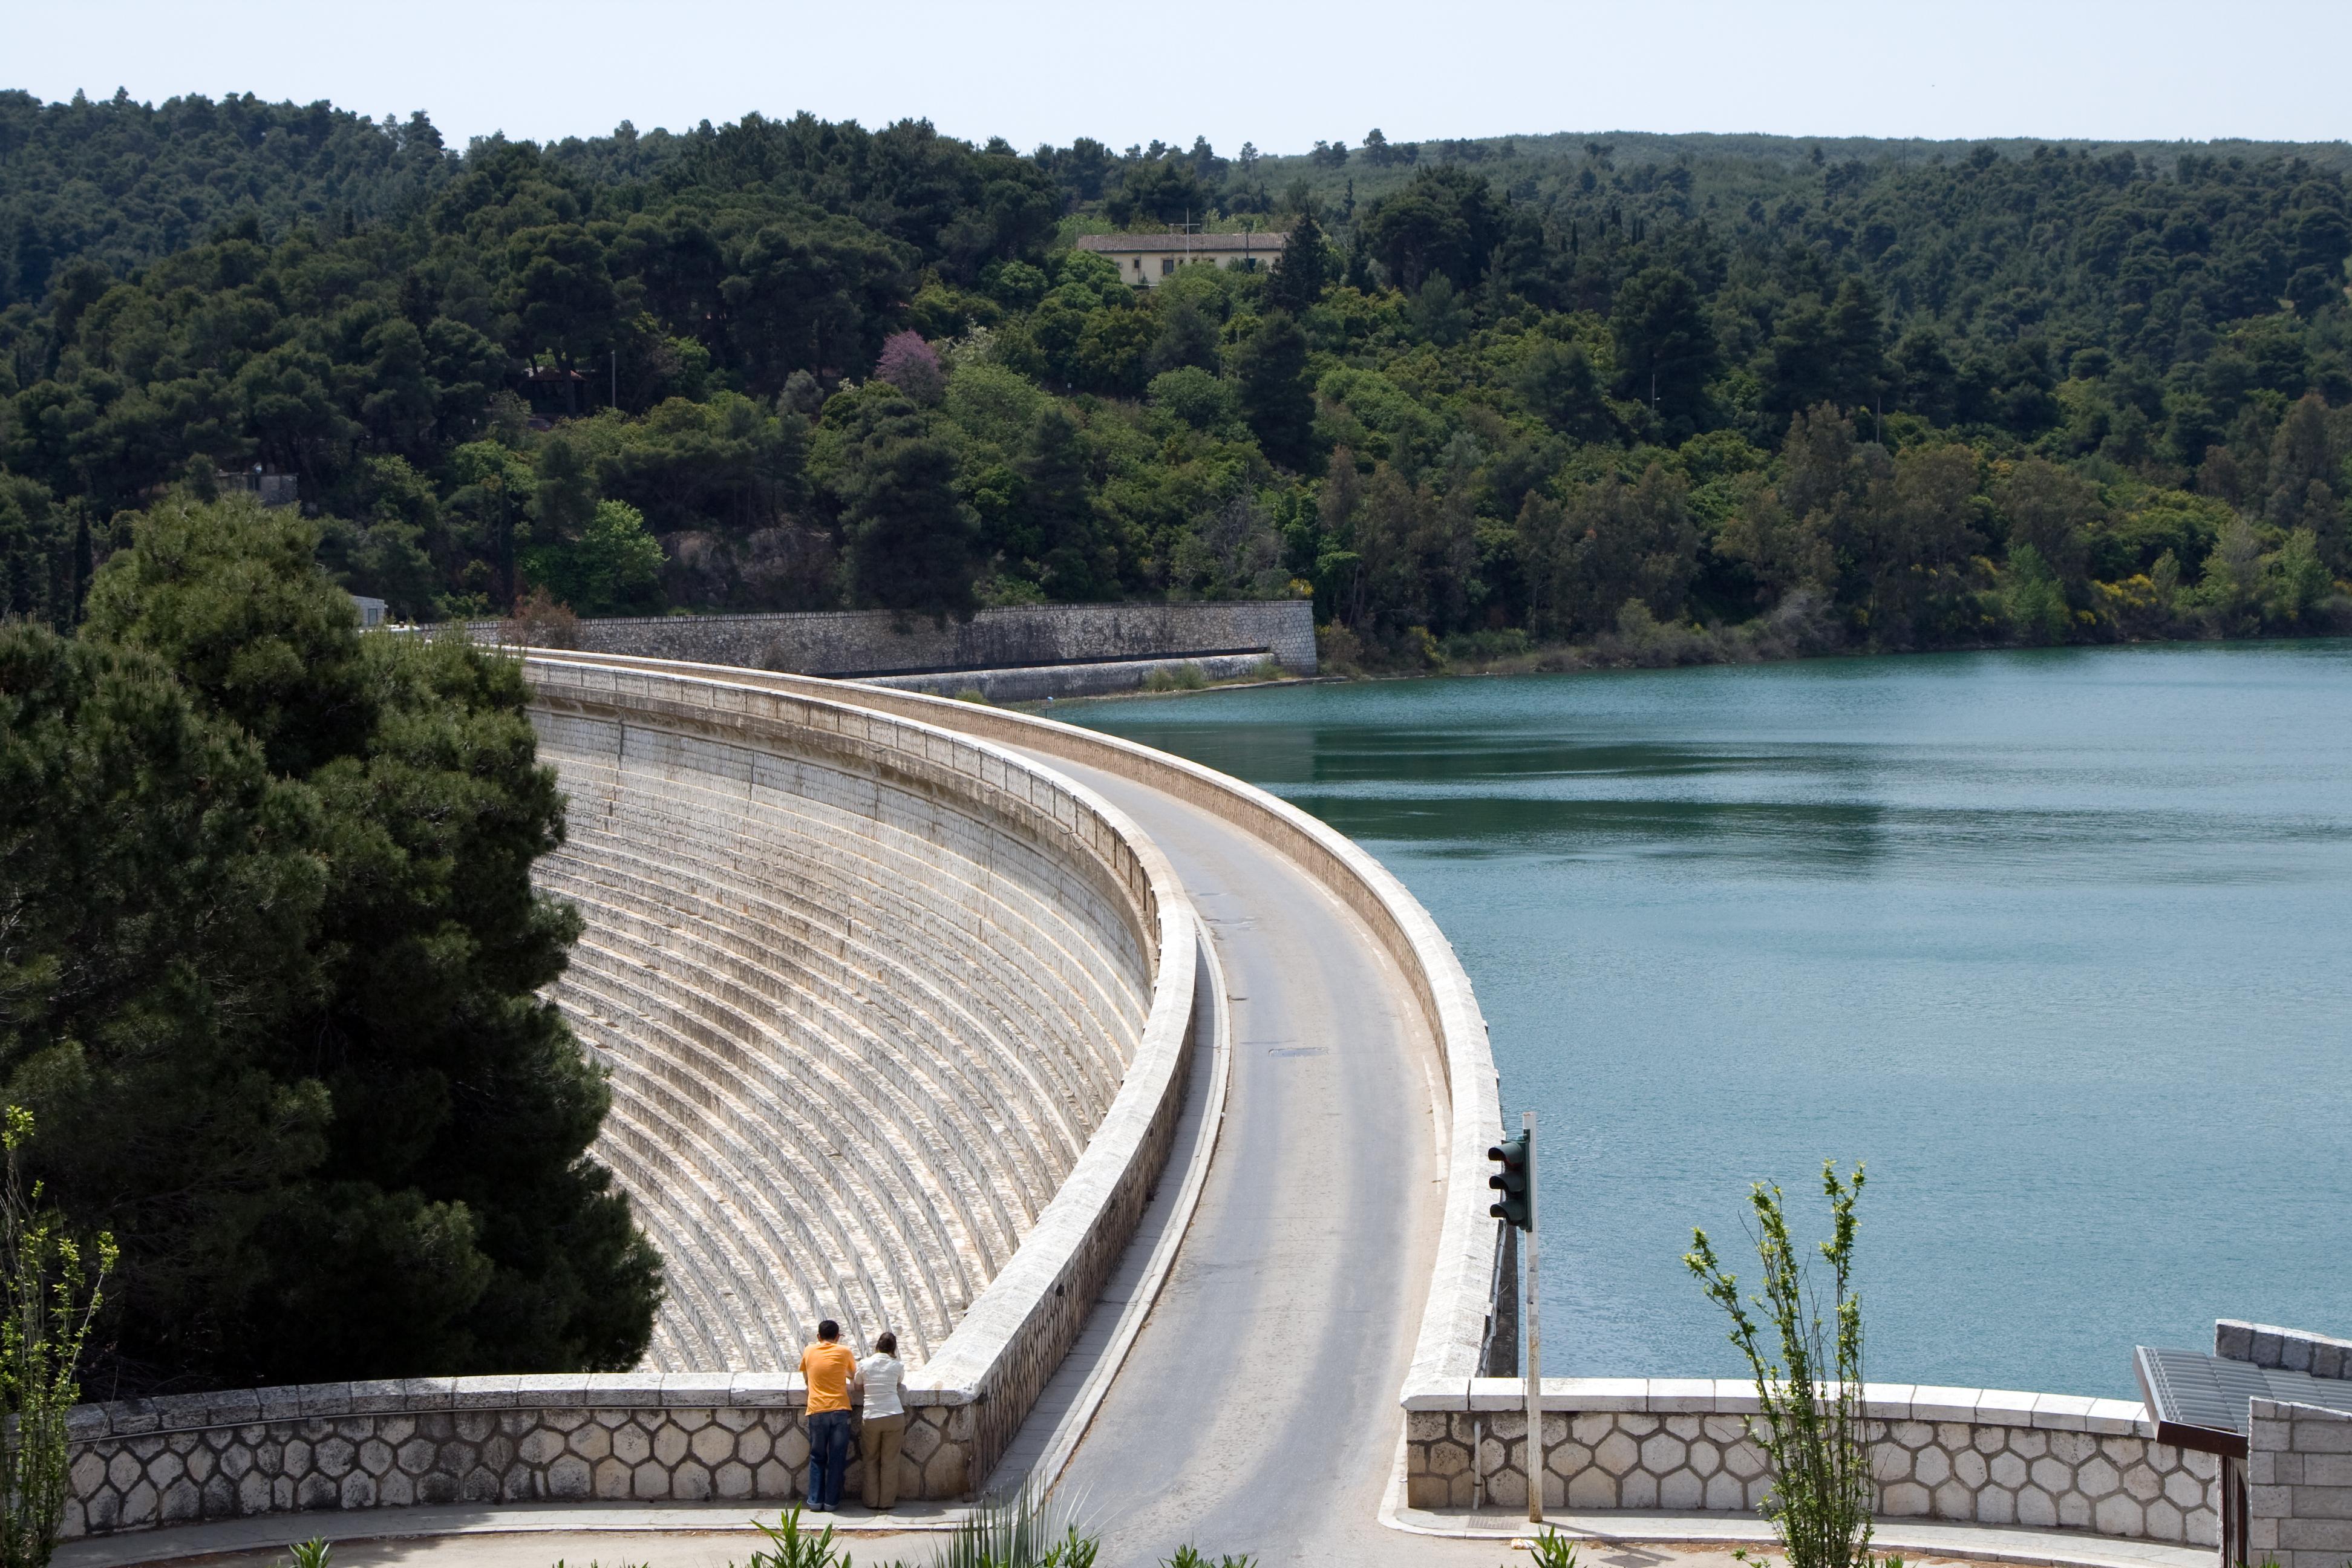 File:Lake Marathon Dam, Greece.jpg - Wikipedia